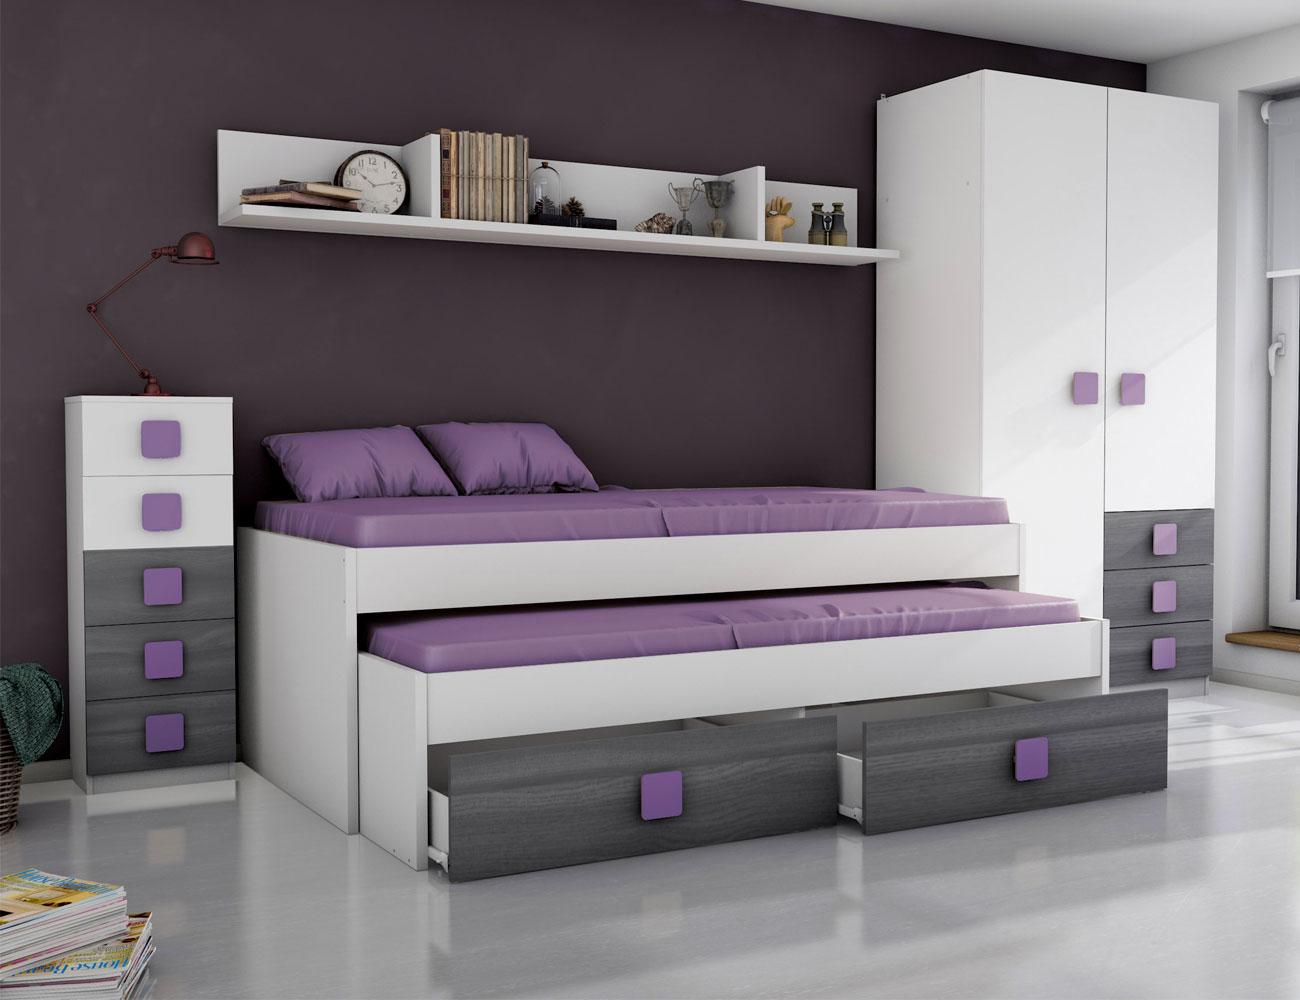 Dormitorio juvenil ceniza azul1